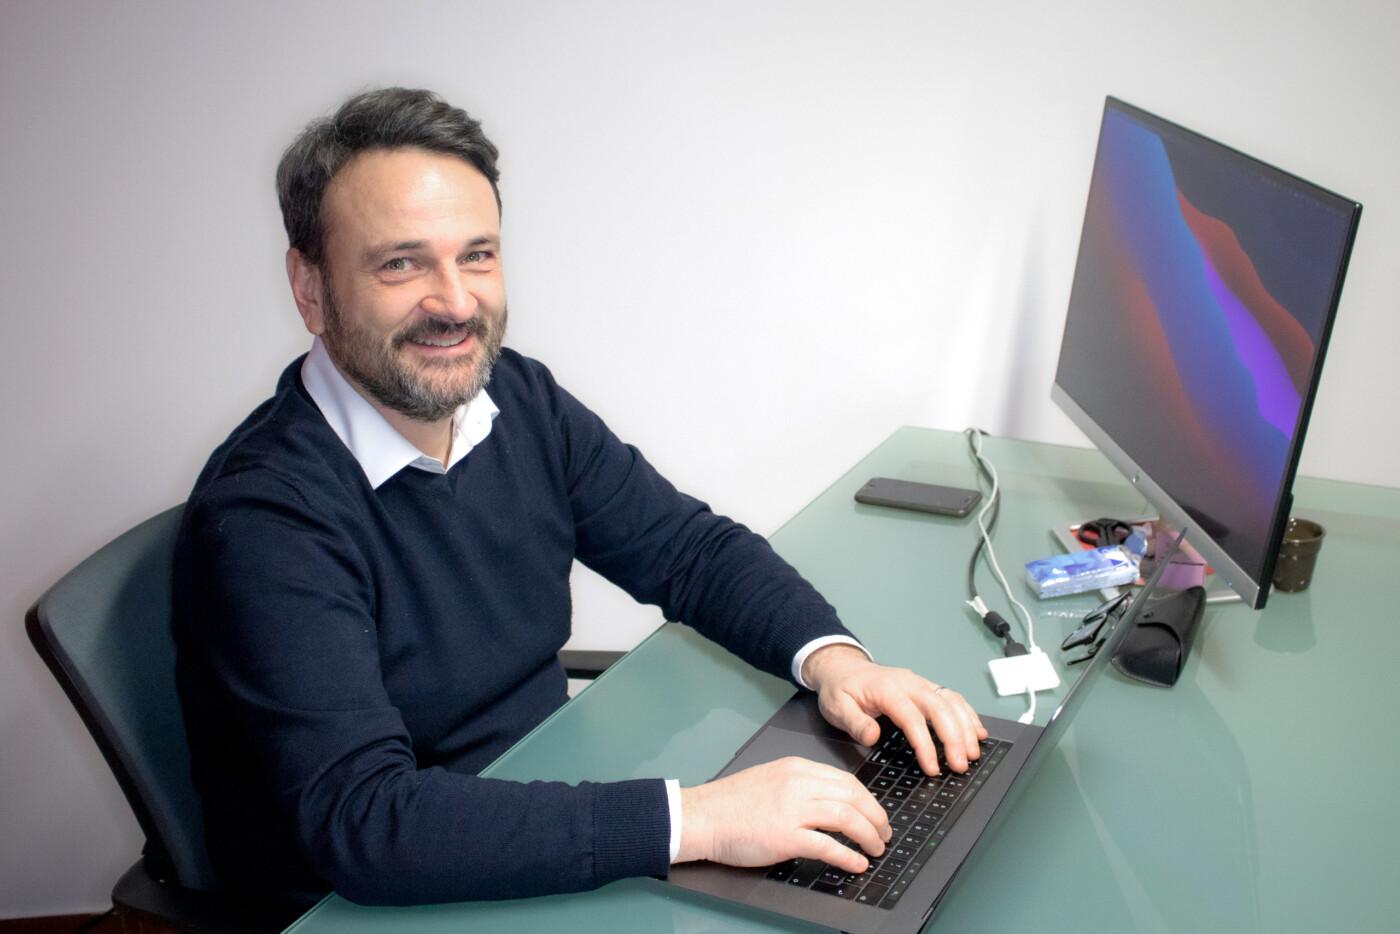 Luca Perlo Founder - Responsabile marketing e commerciale